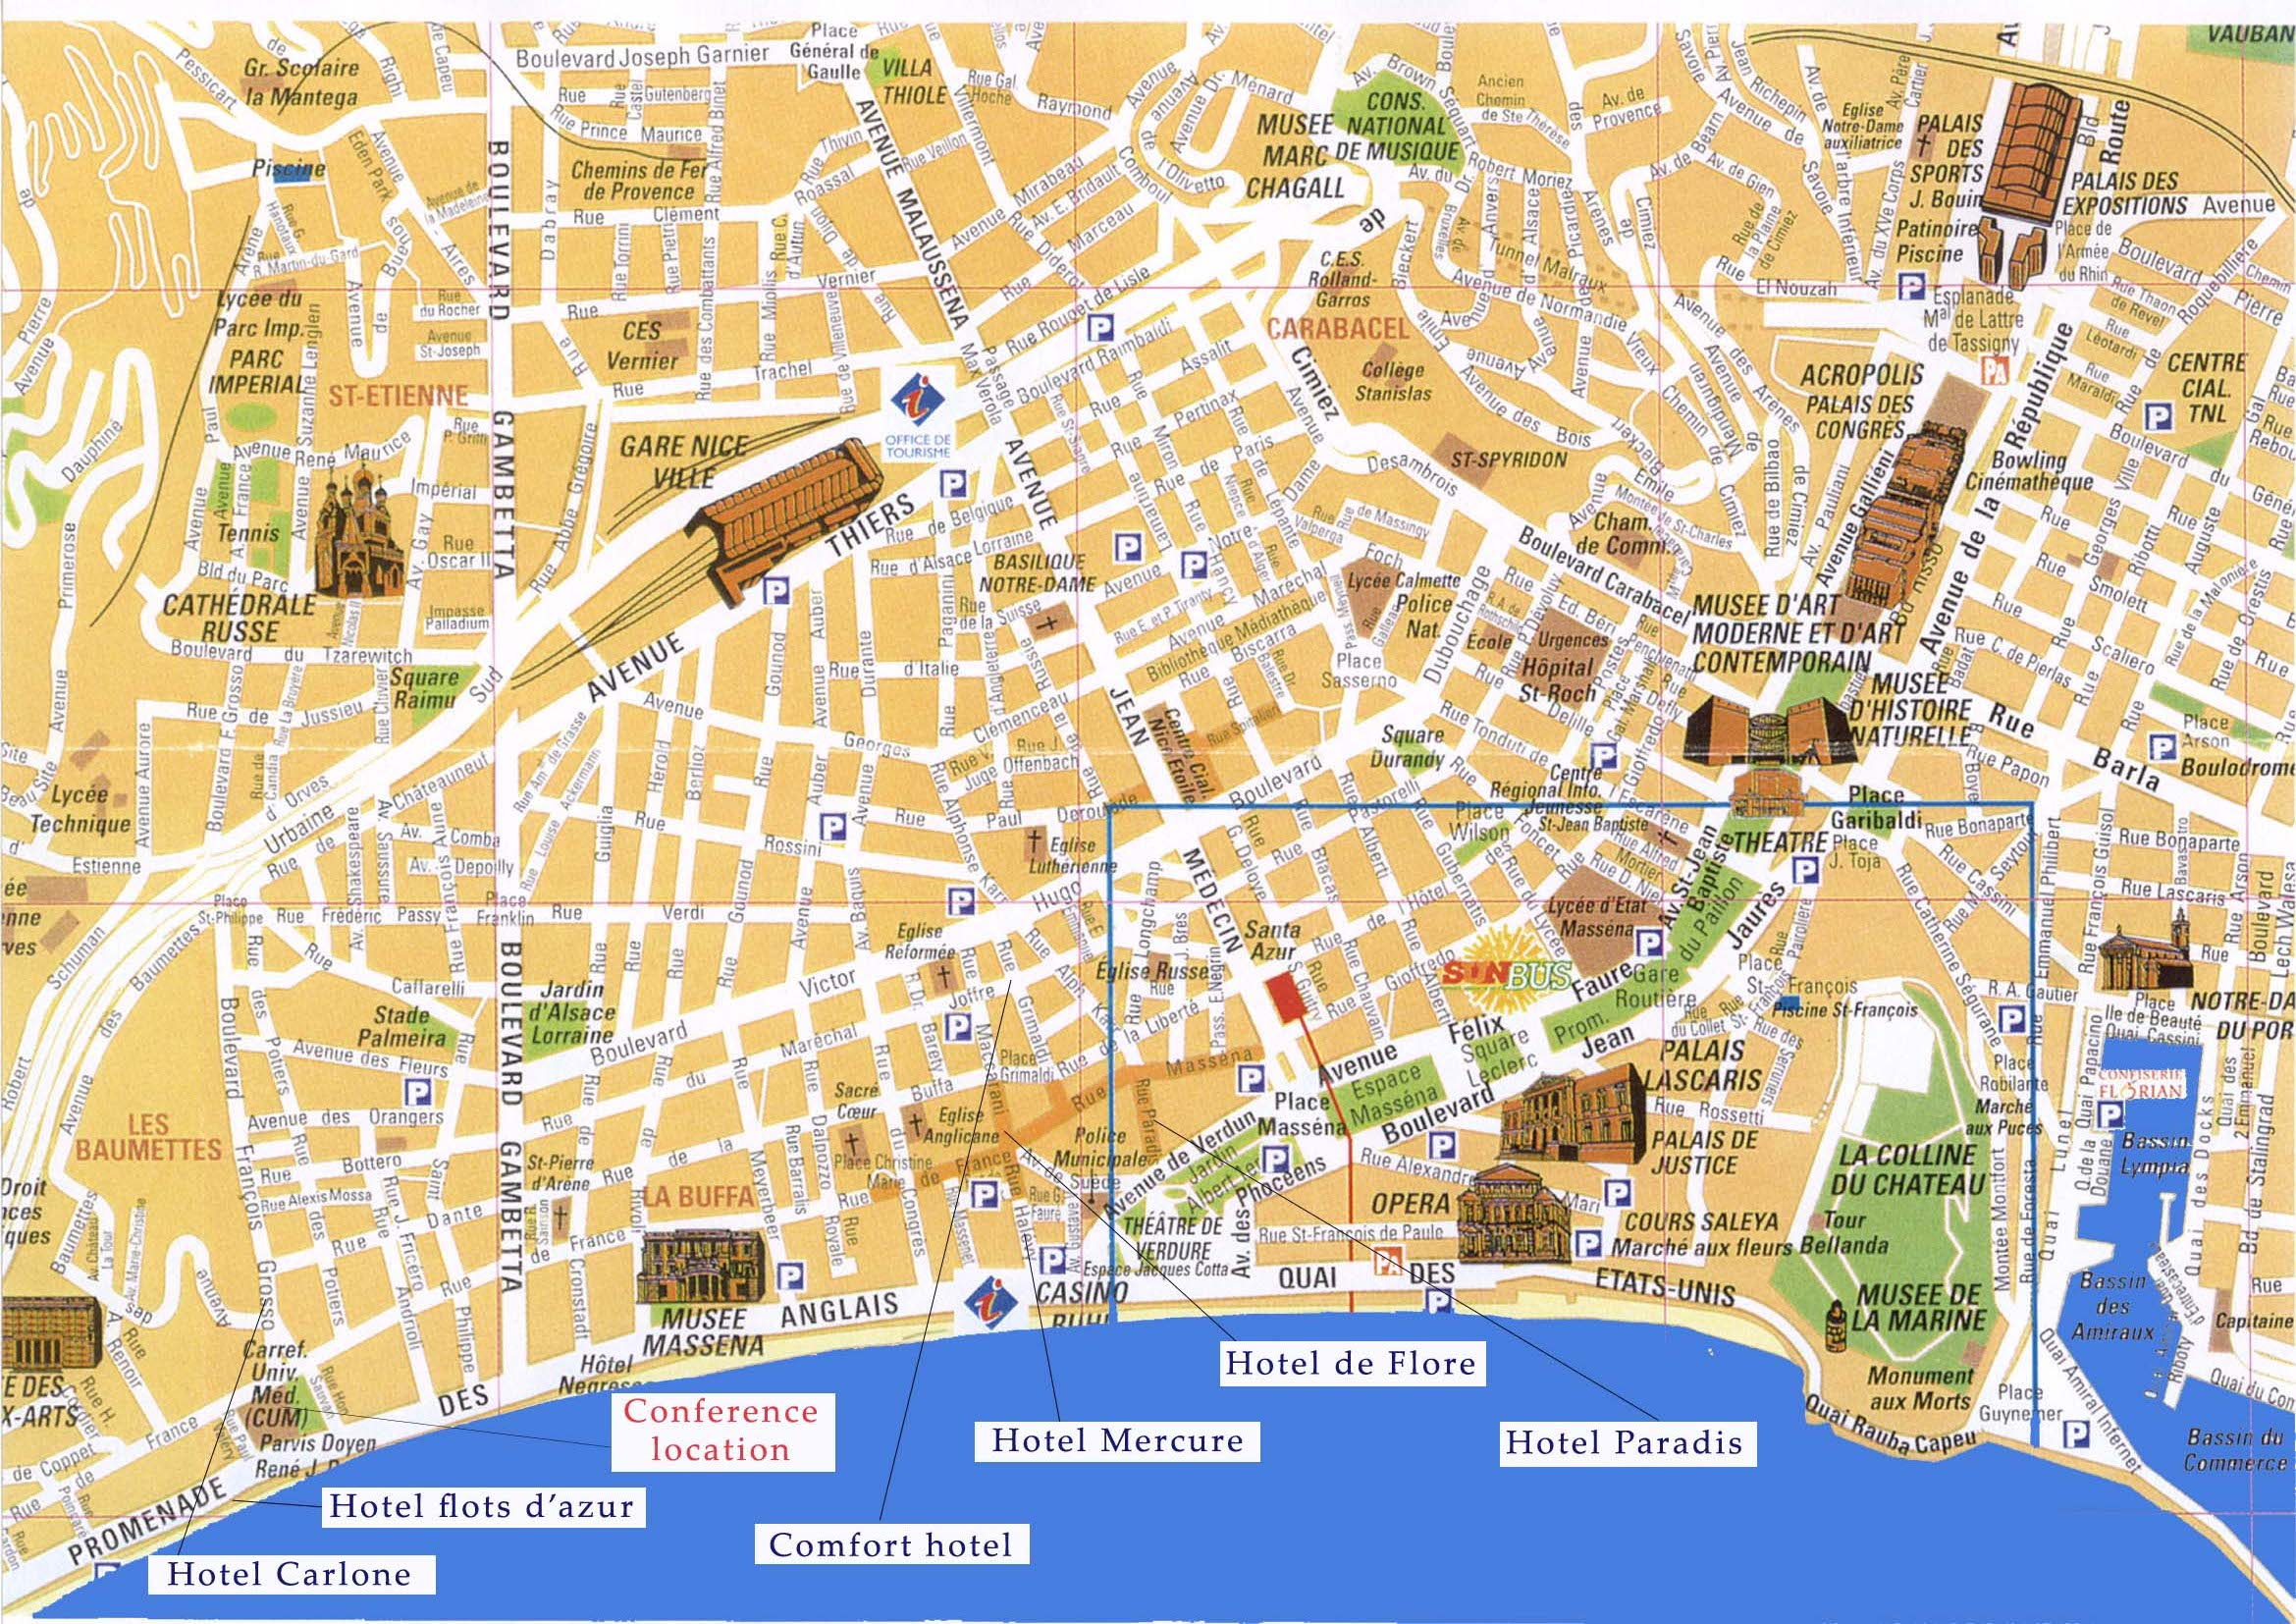 Paris to Nice In 12 Days? - France Forum - TripAdvisor